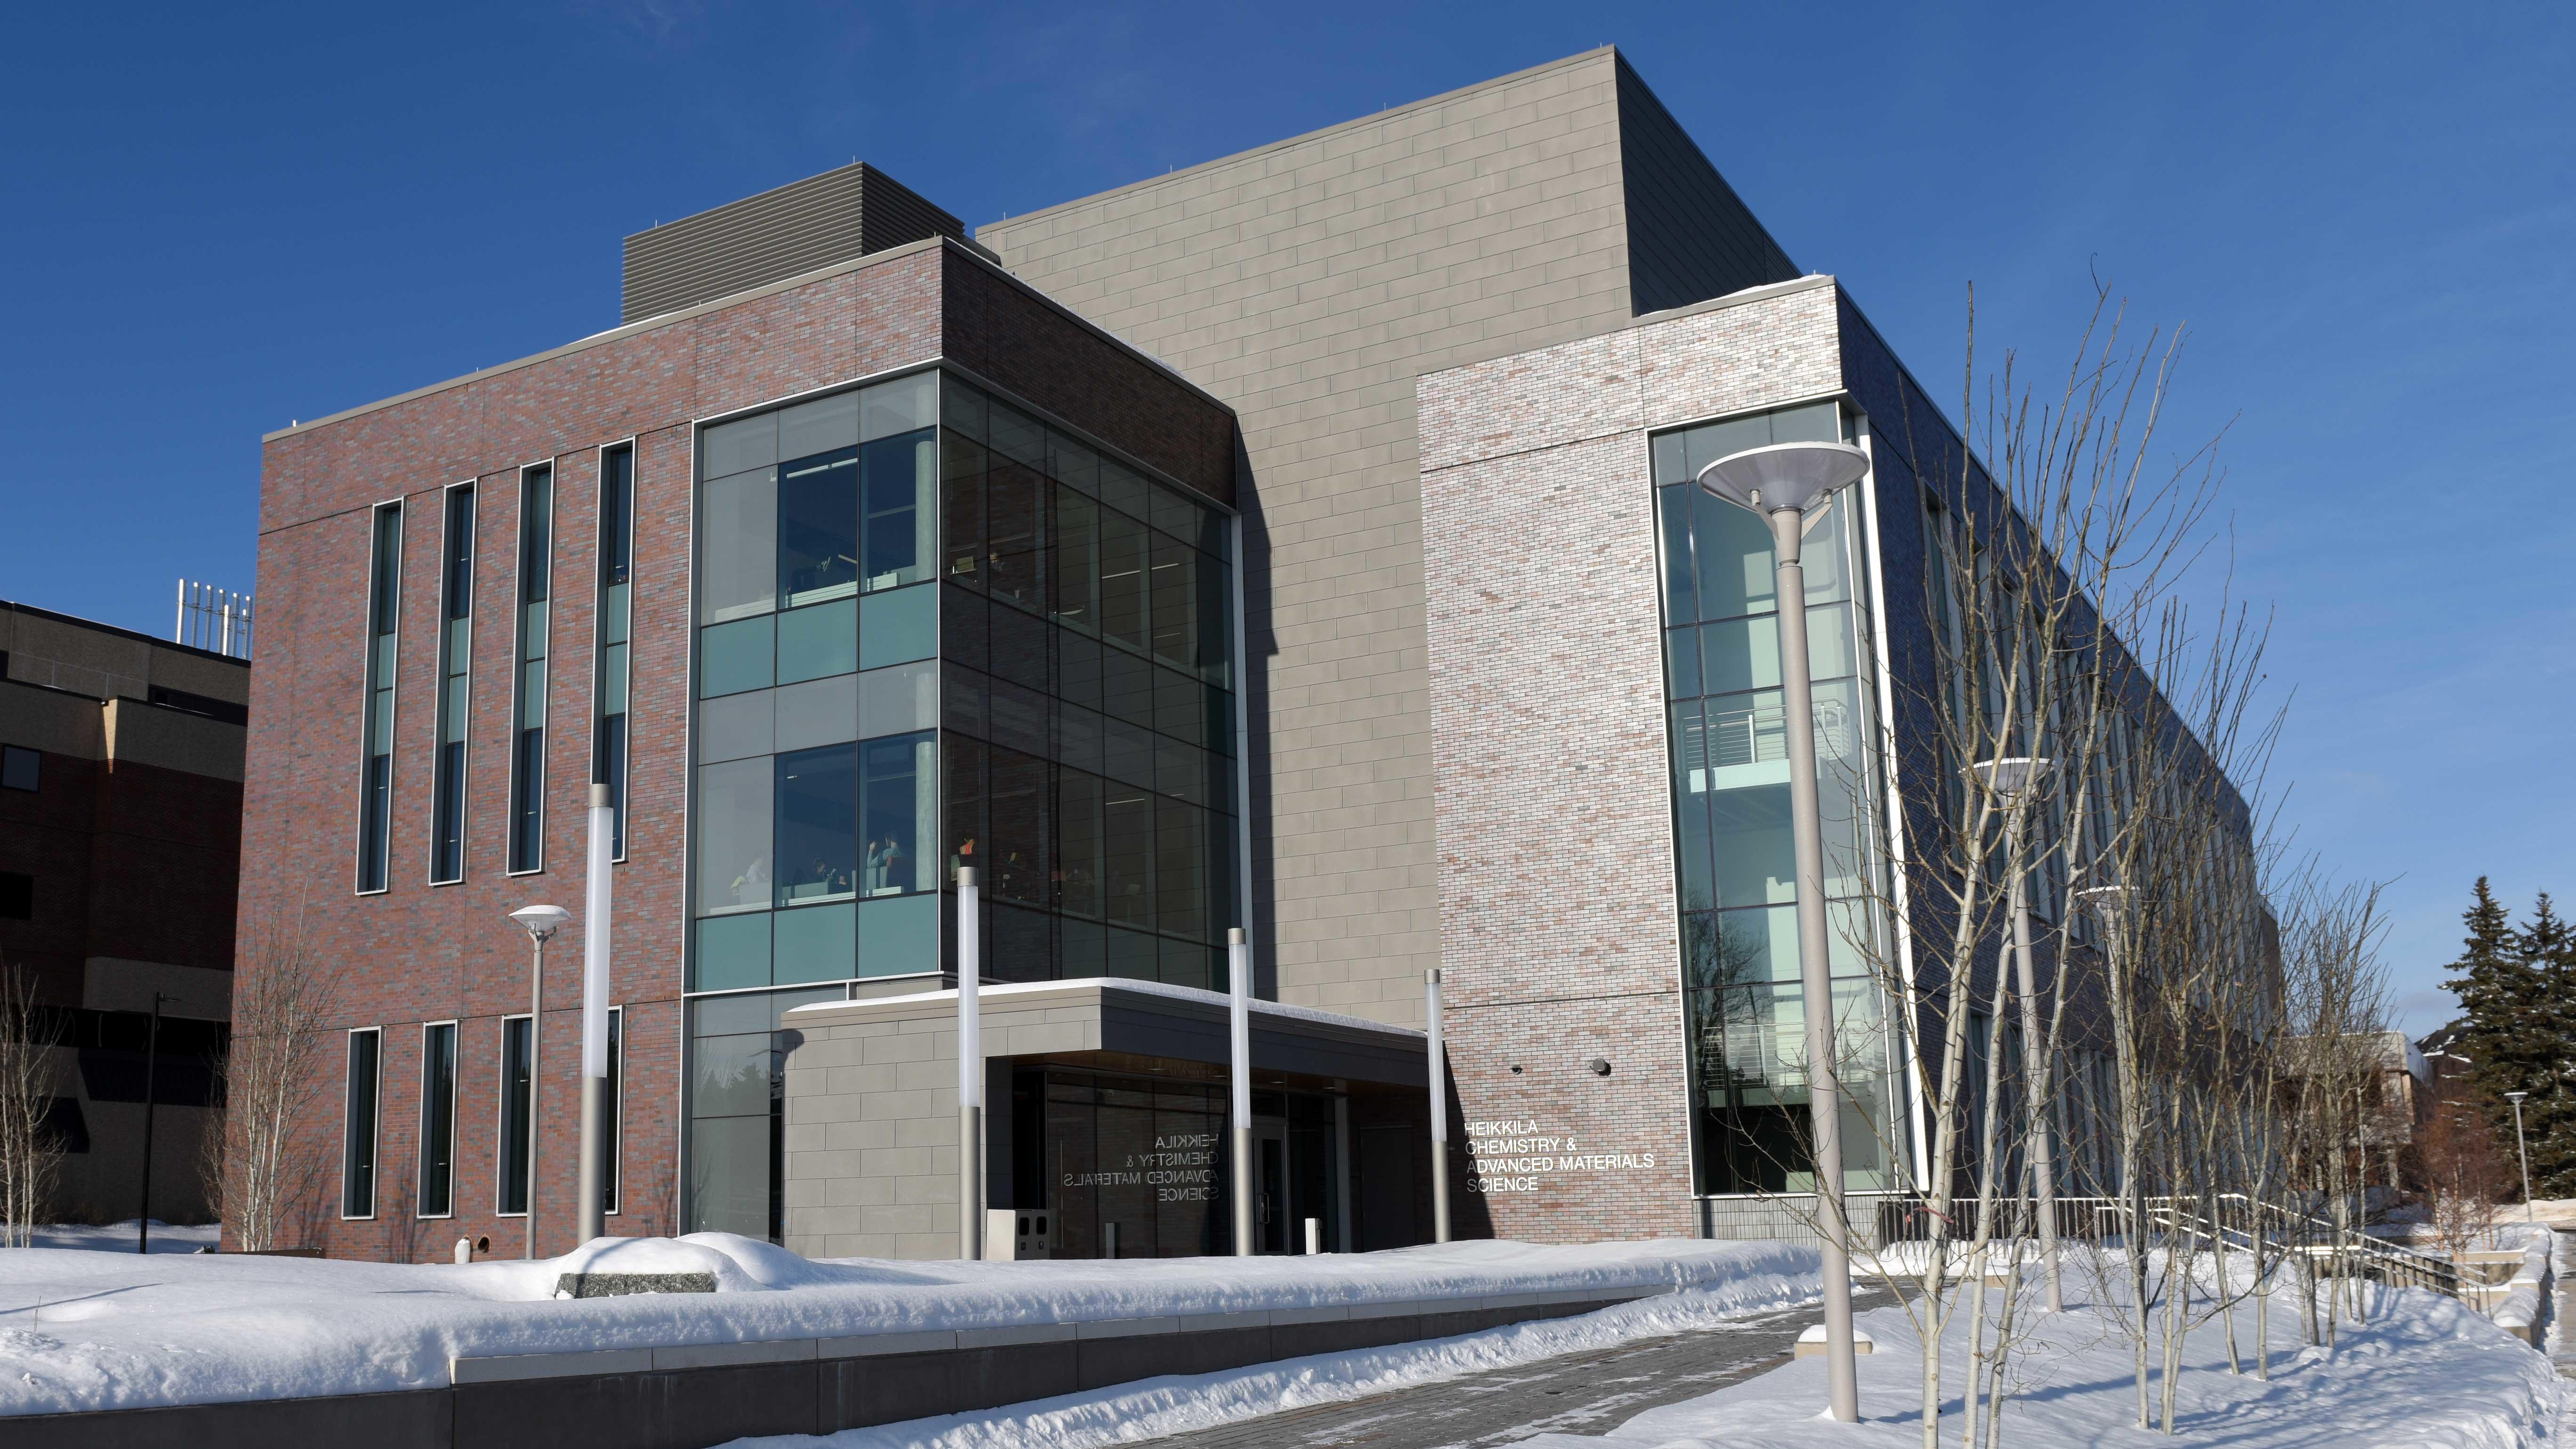 UMD's Civil Engineering building in the winter